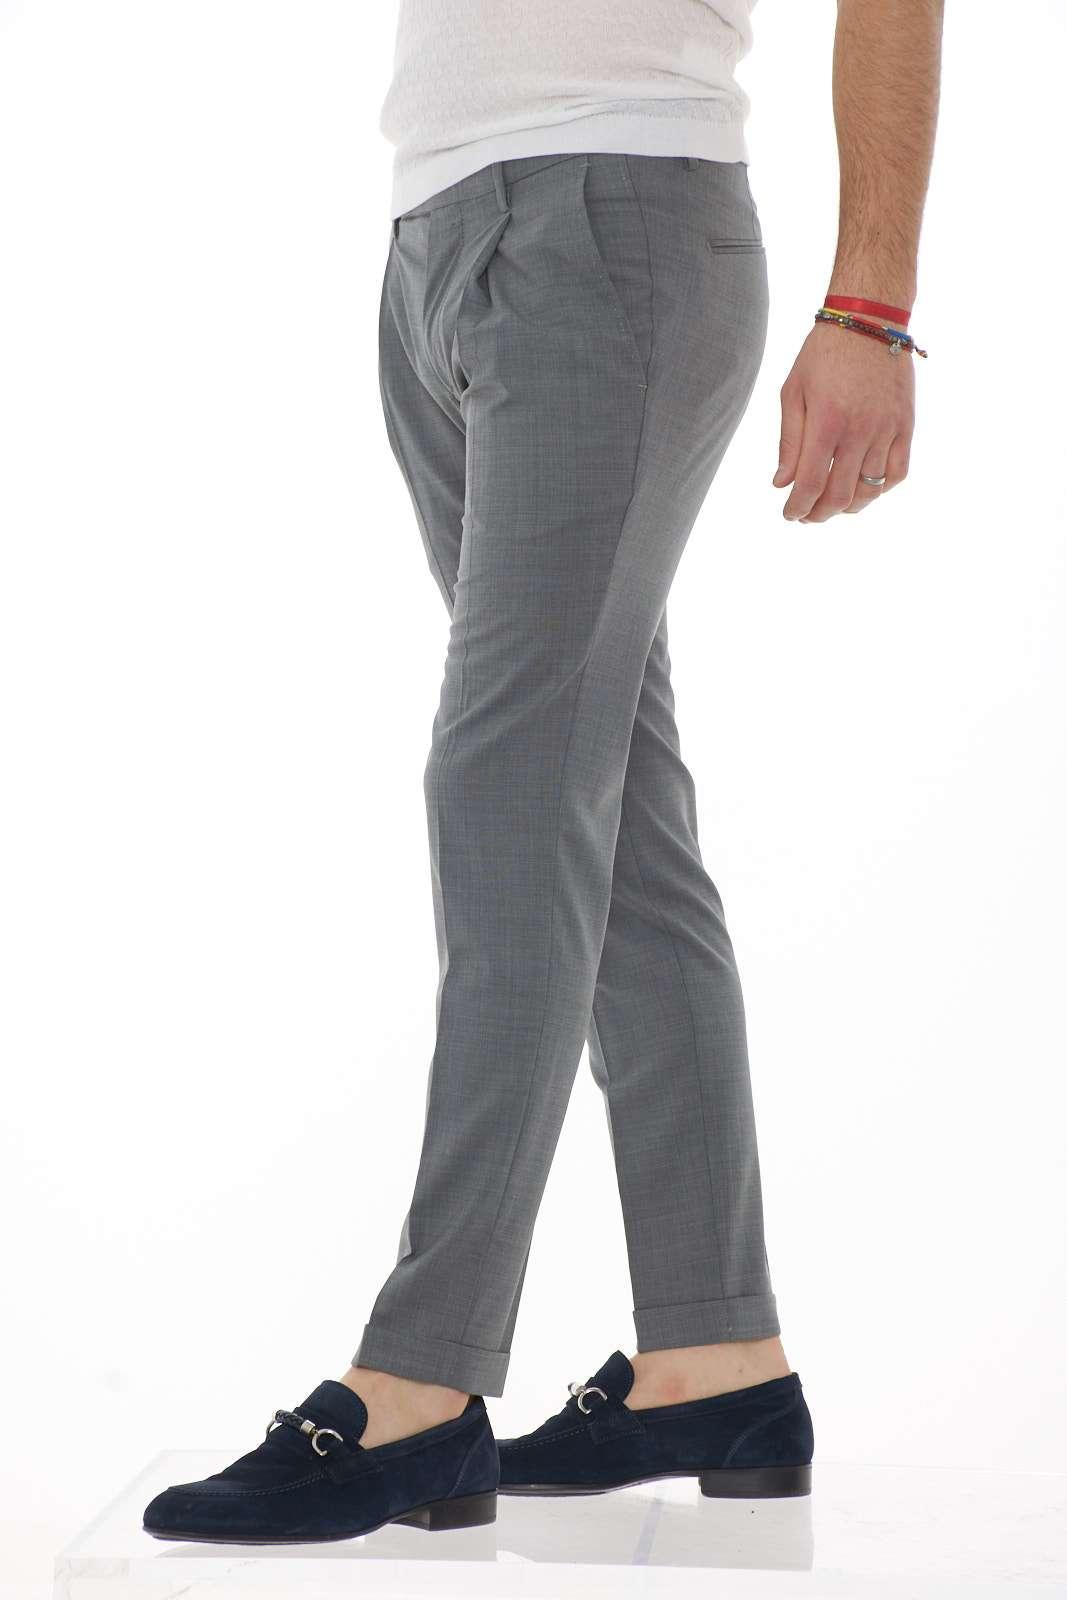 https://www.parmax.com/media/catalog/product/a/i/PE-outlet_parmax-pantaloni-uomo-Michael-Coal-FREDERICK3343-B.jpg